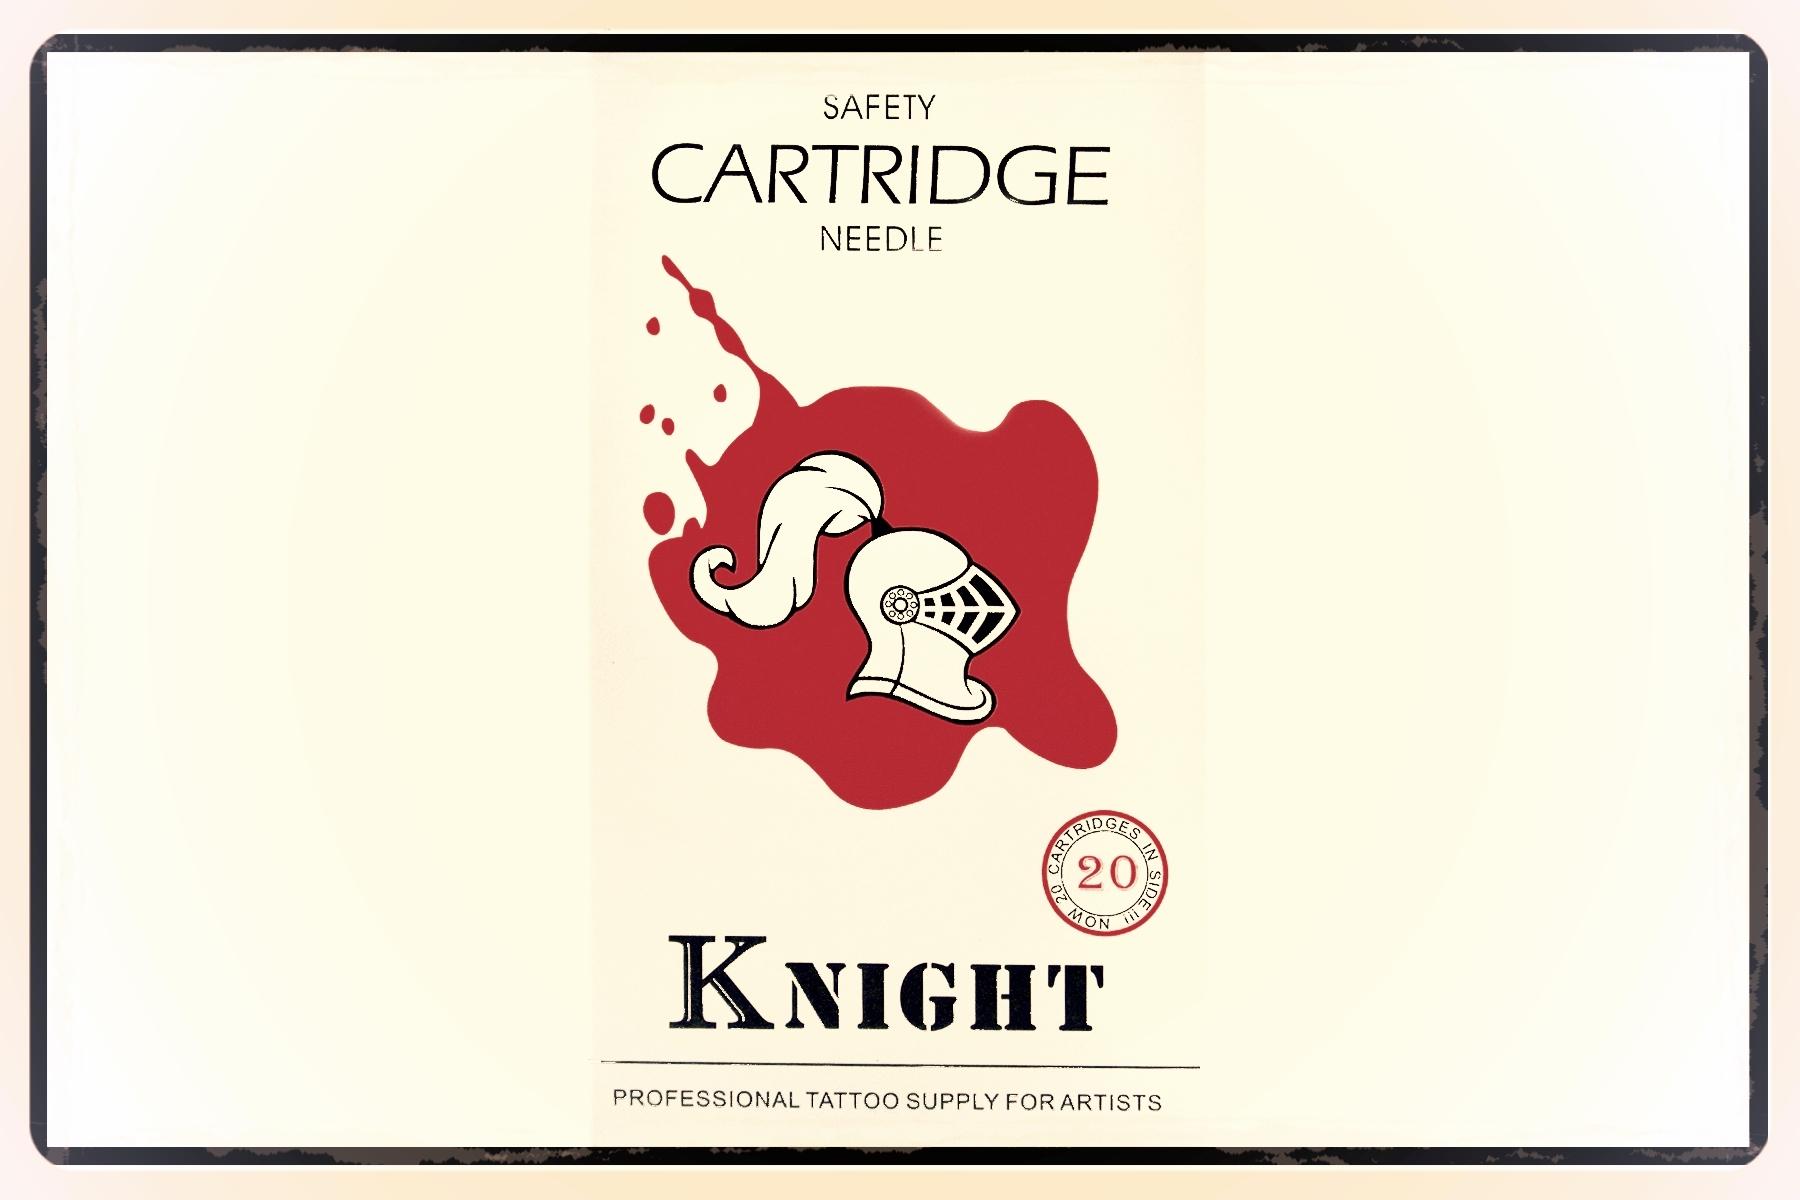 KNIGHT CARTRIDGE NEEDLES